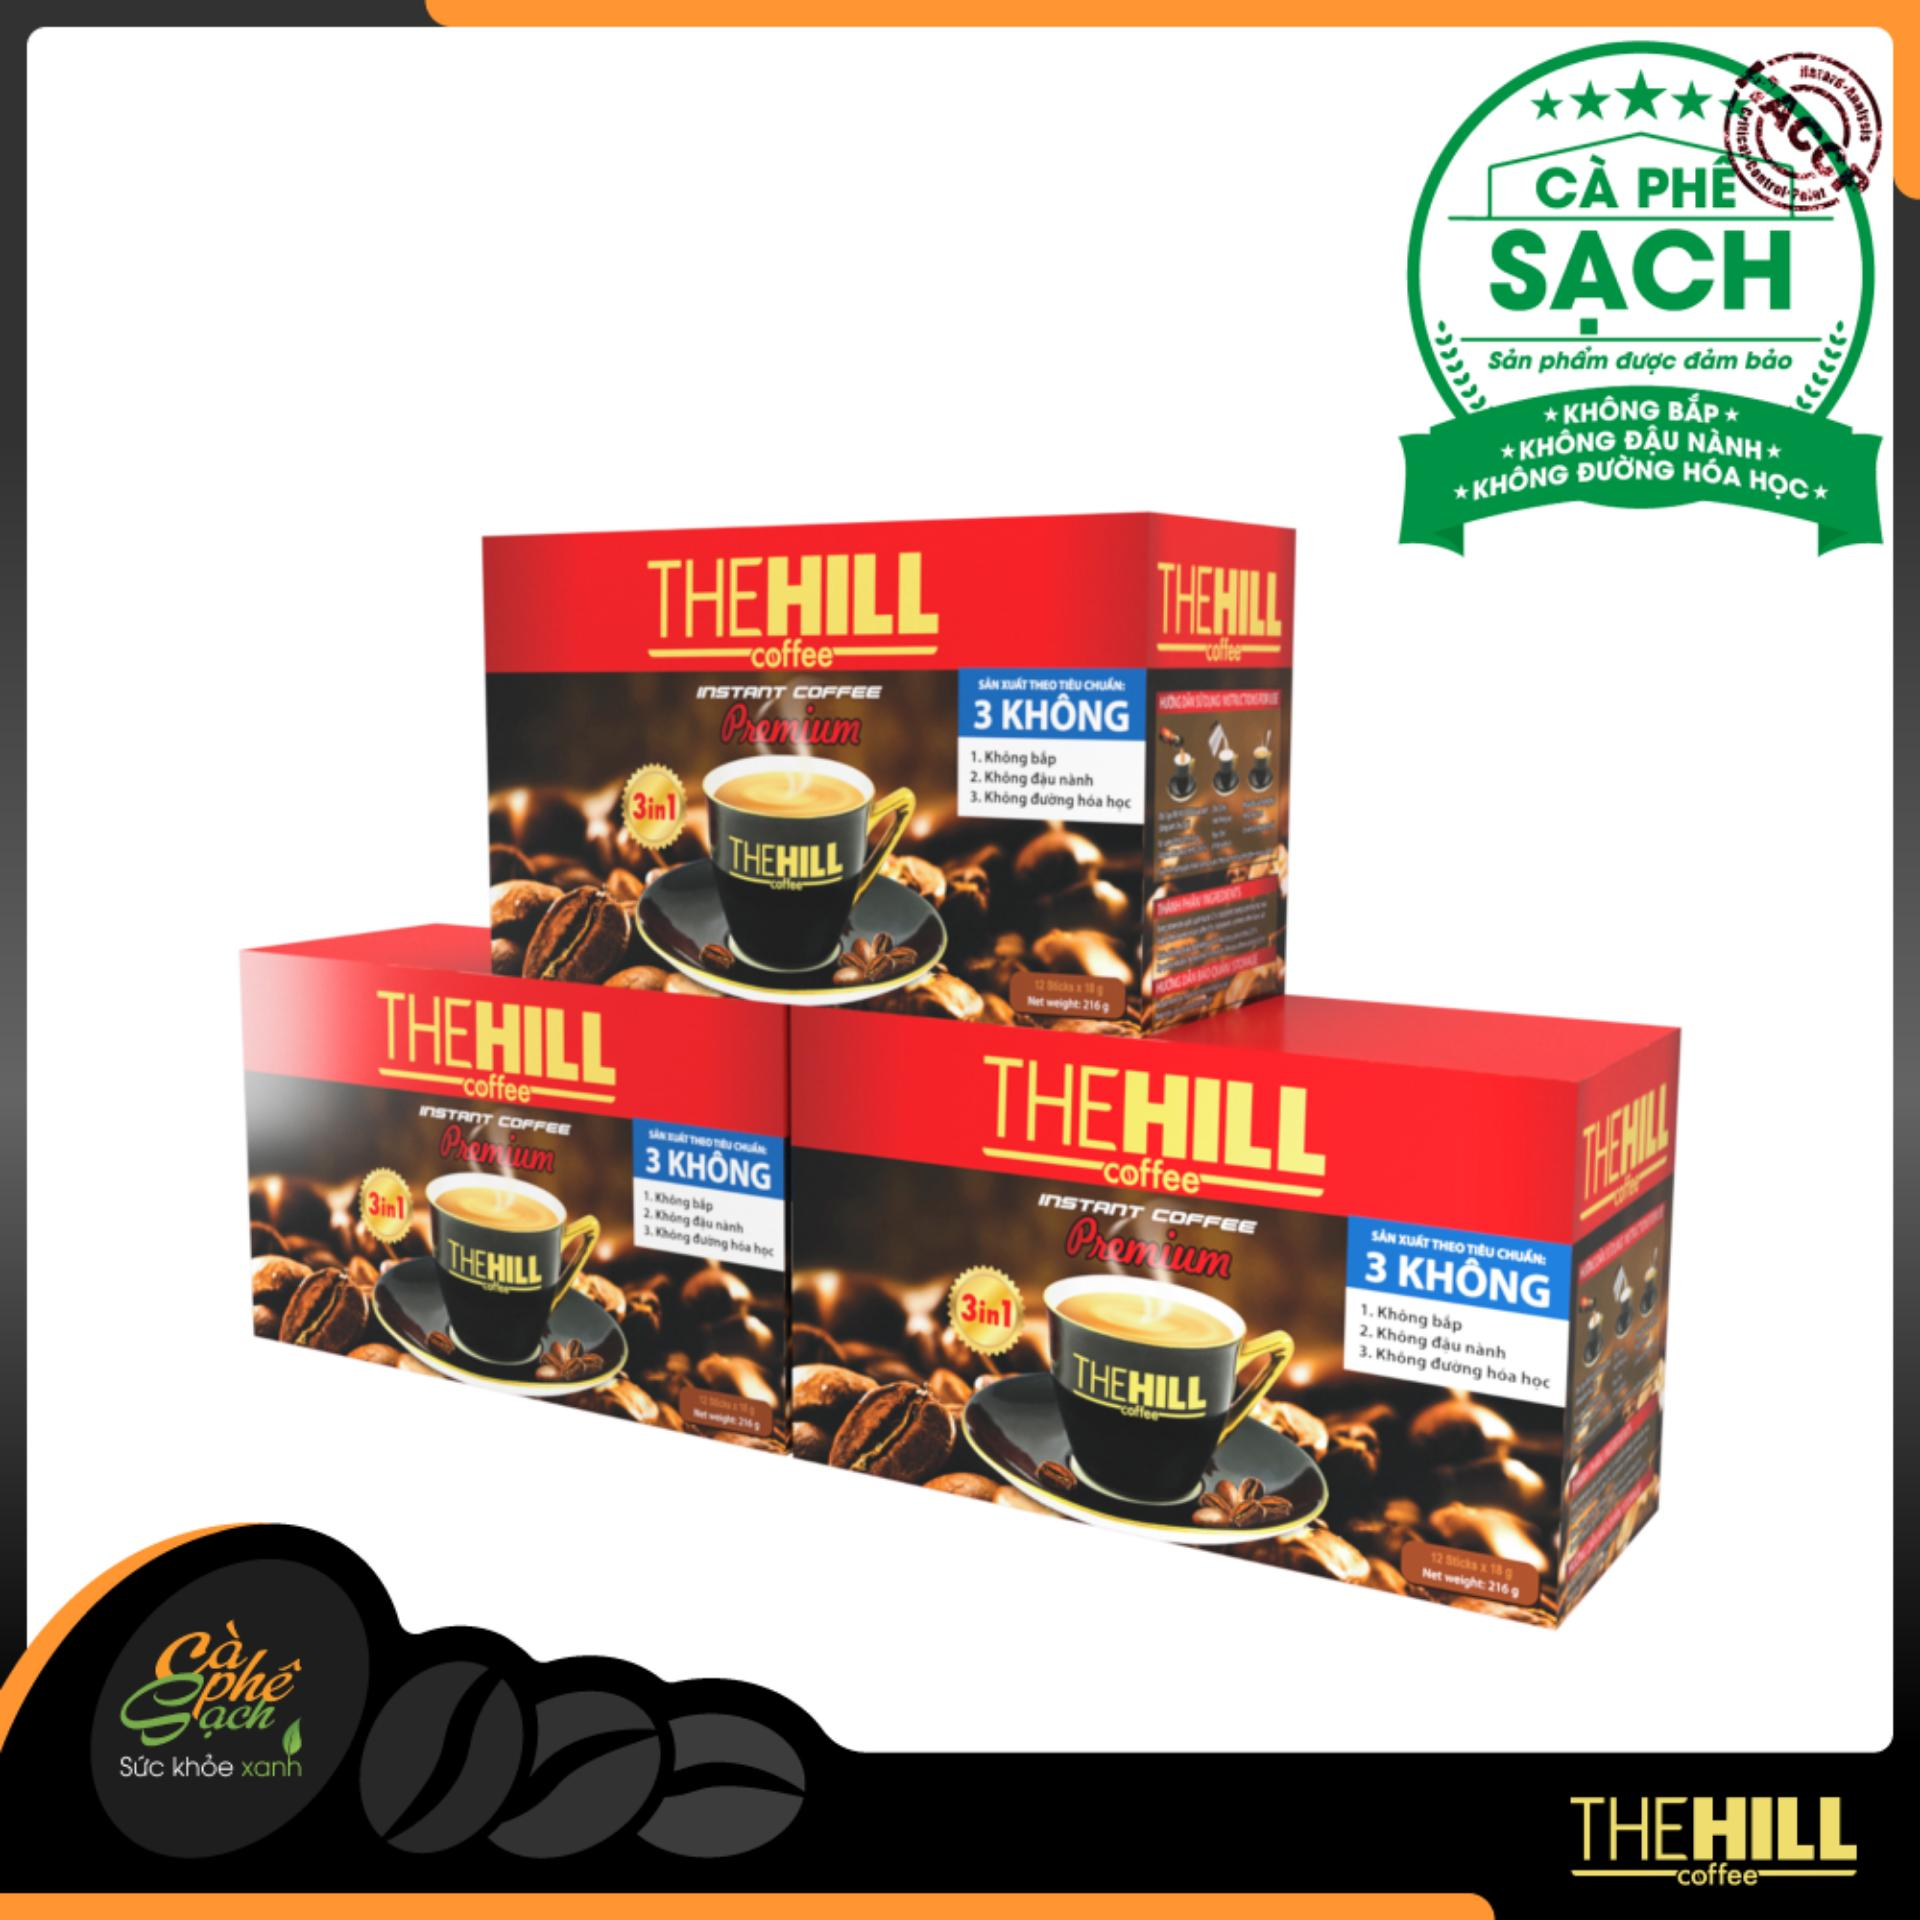 Bán Combo 3 Hộp Ca Phe Hoa Tan The Hill Coffee Premium The Hill Coffee Trong Hồ Chí Minh